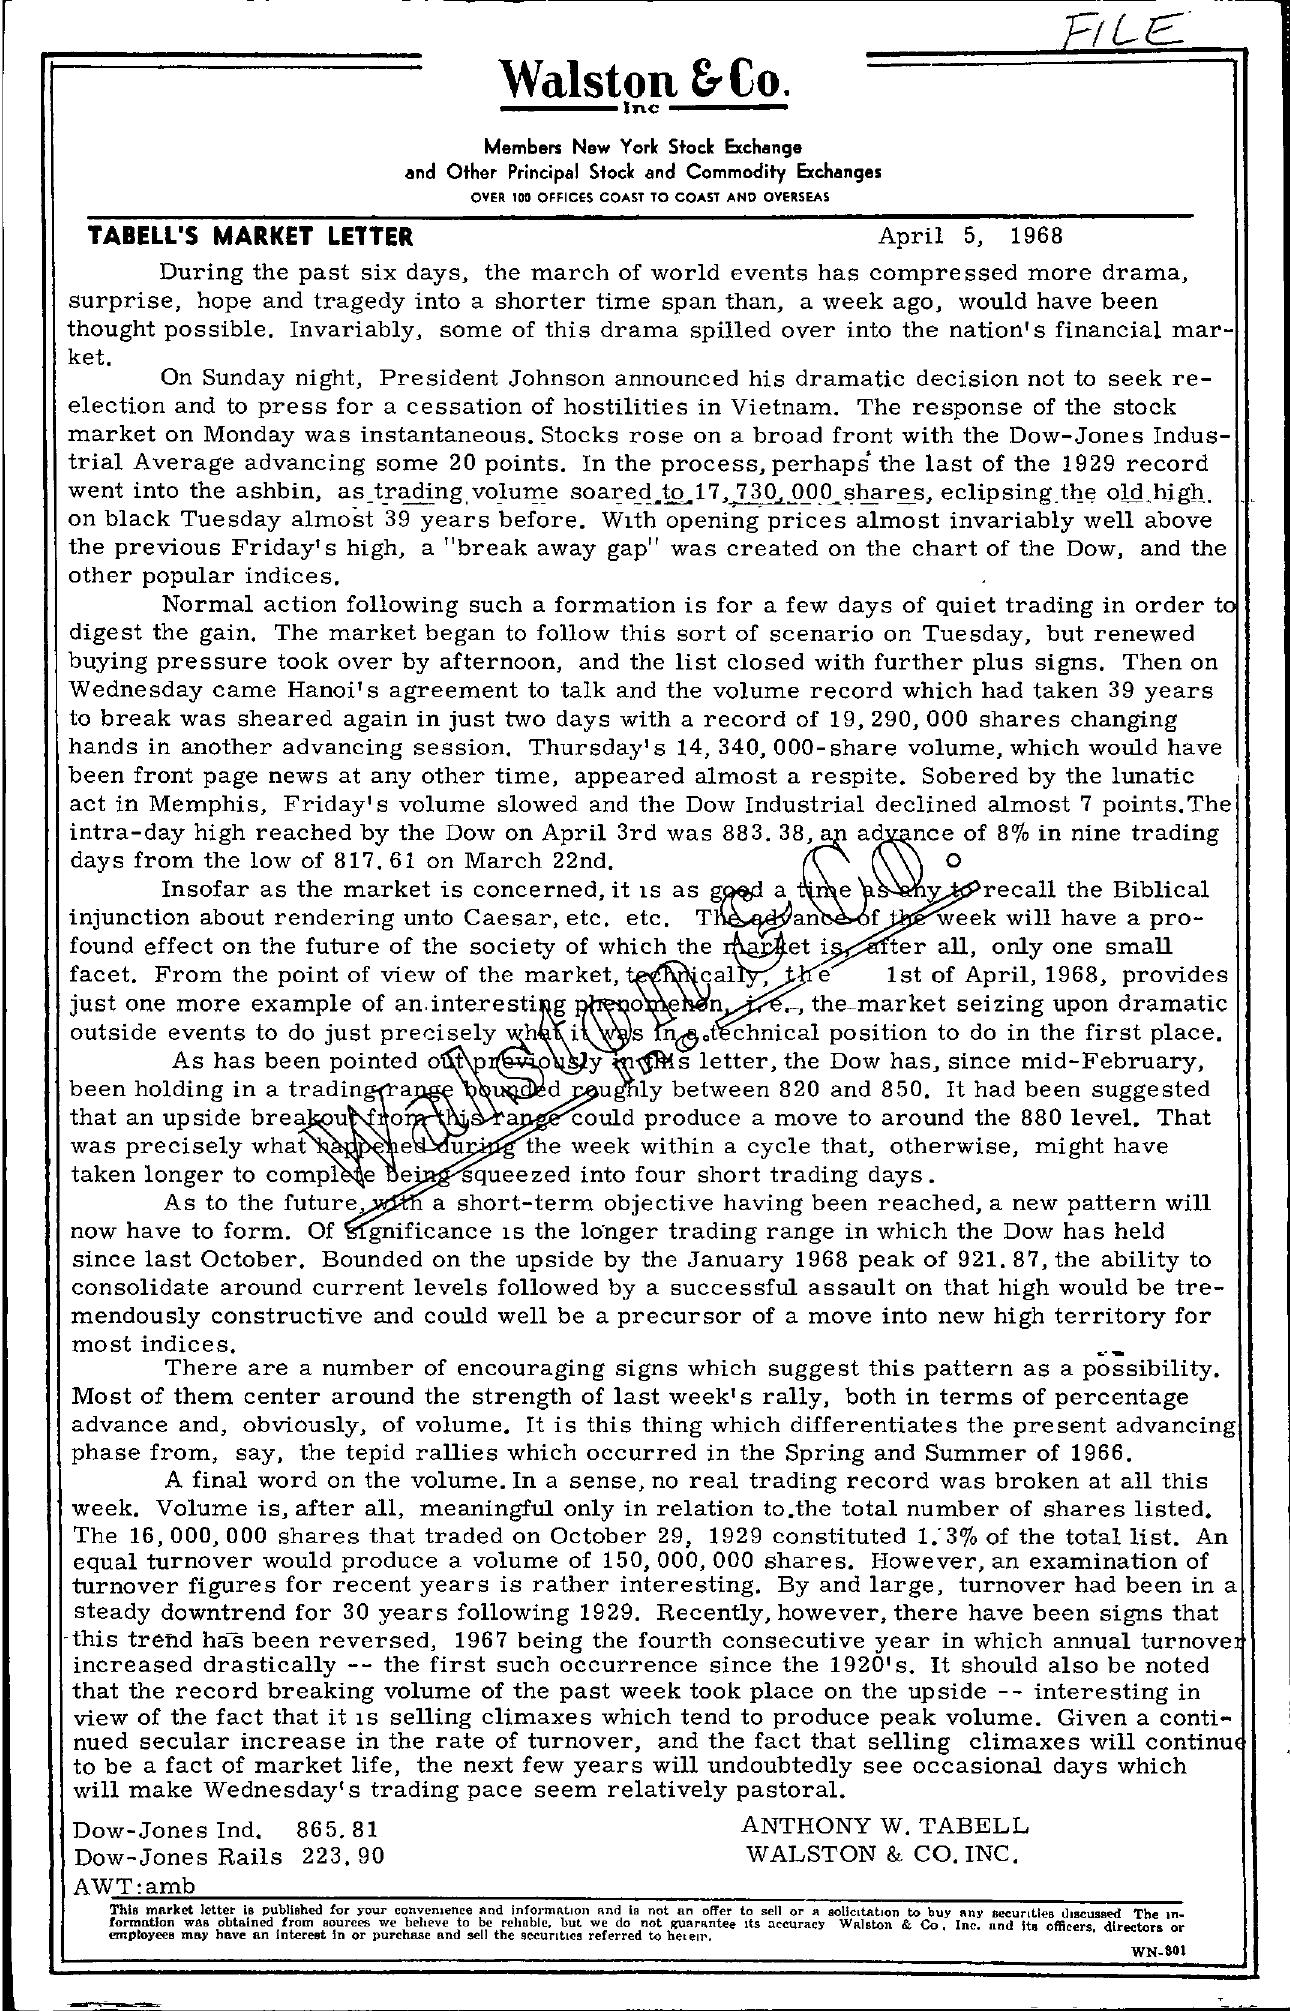 Tabell's Market Letter - April 05, 1968